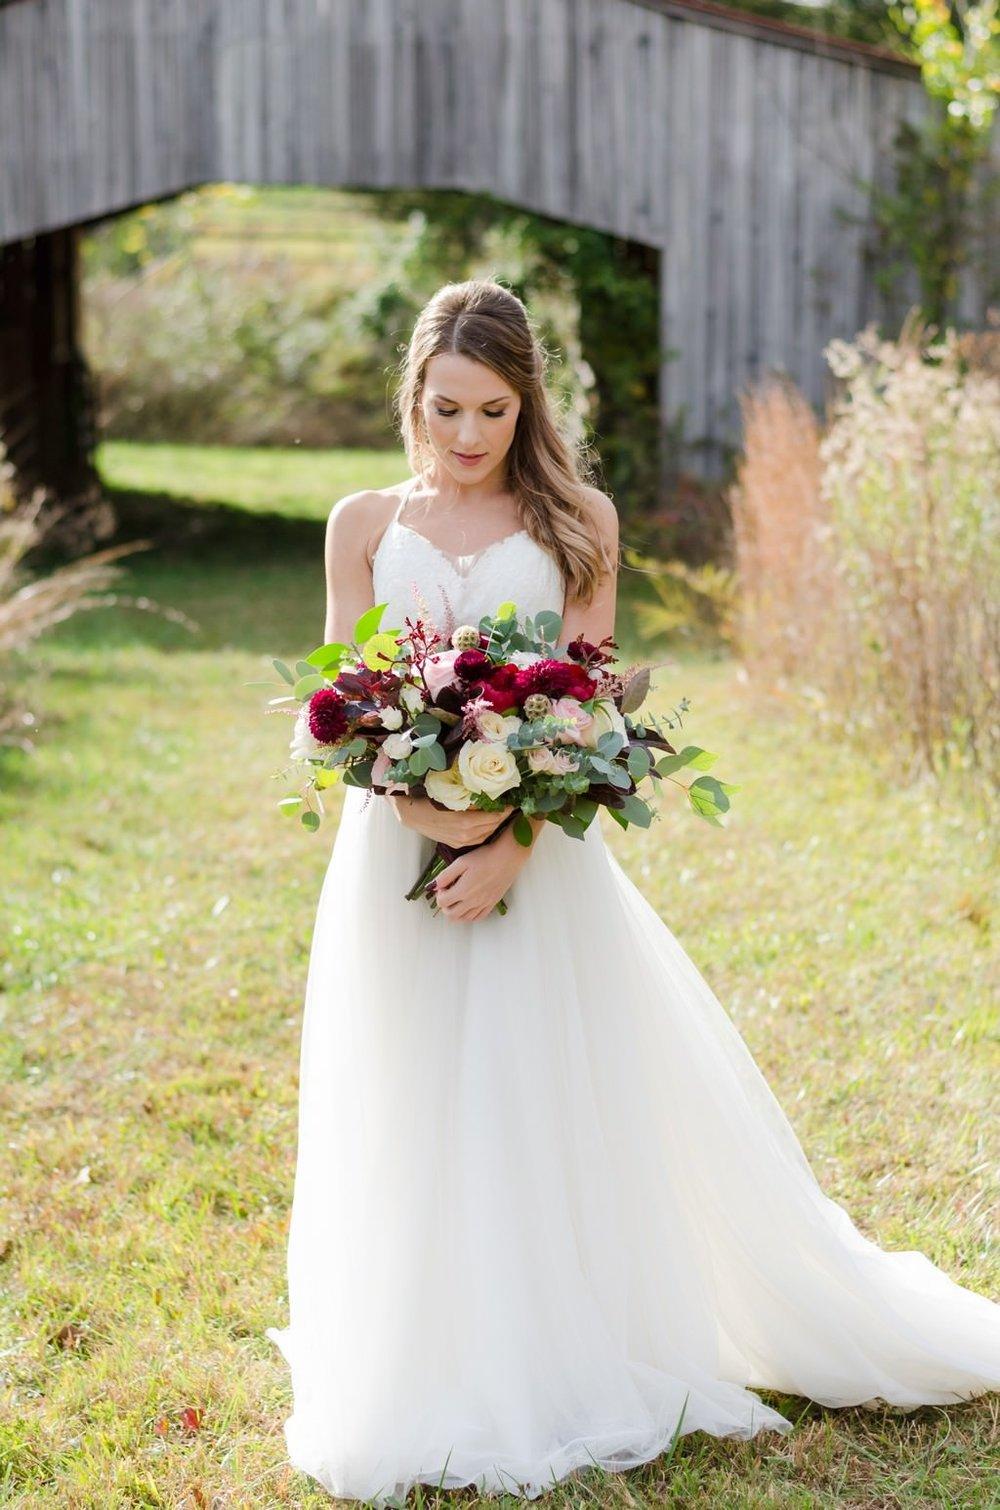 Iriswoods-Mt-Juliet-Blush-and-Burgundy-Nashville-Wedding-Photographer+11